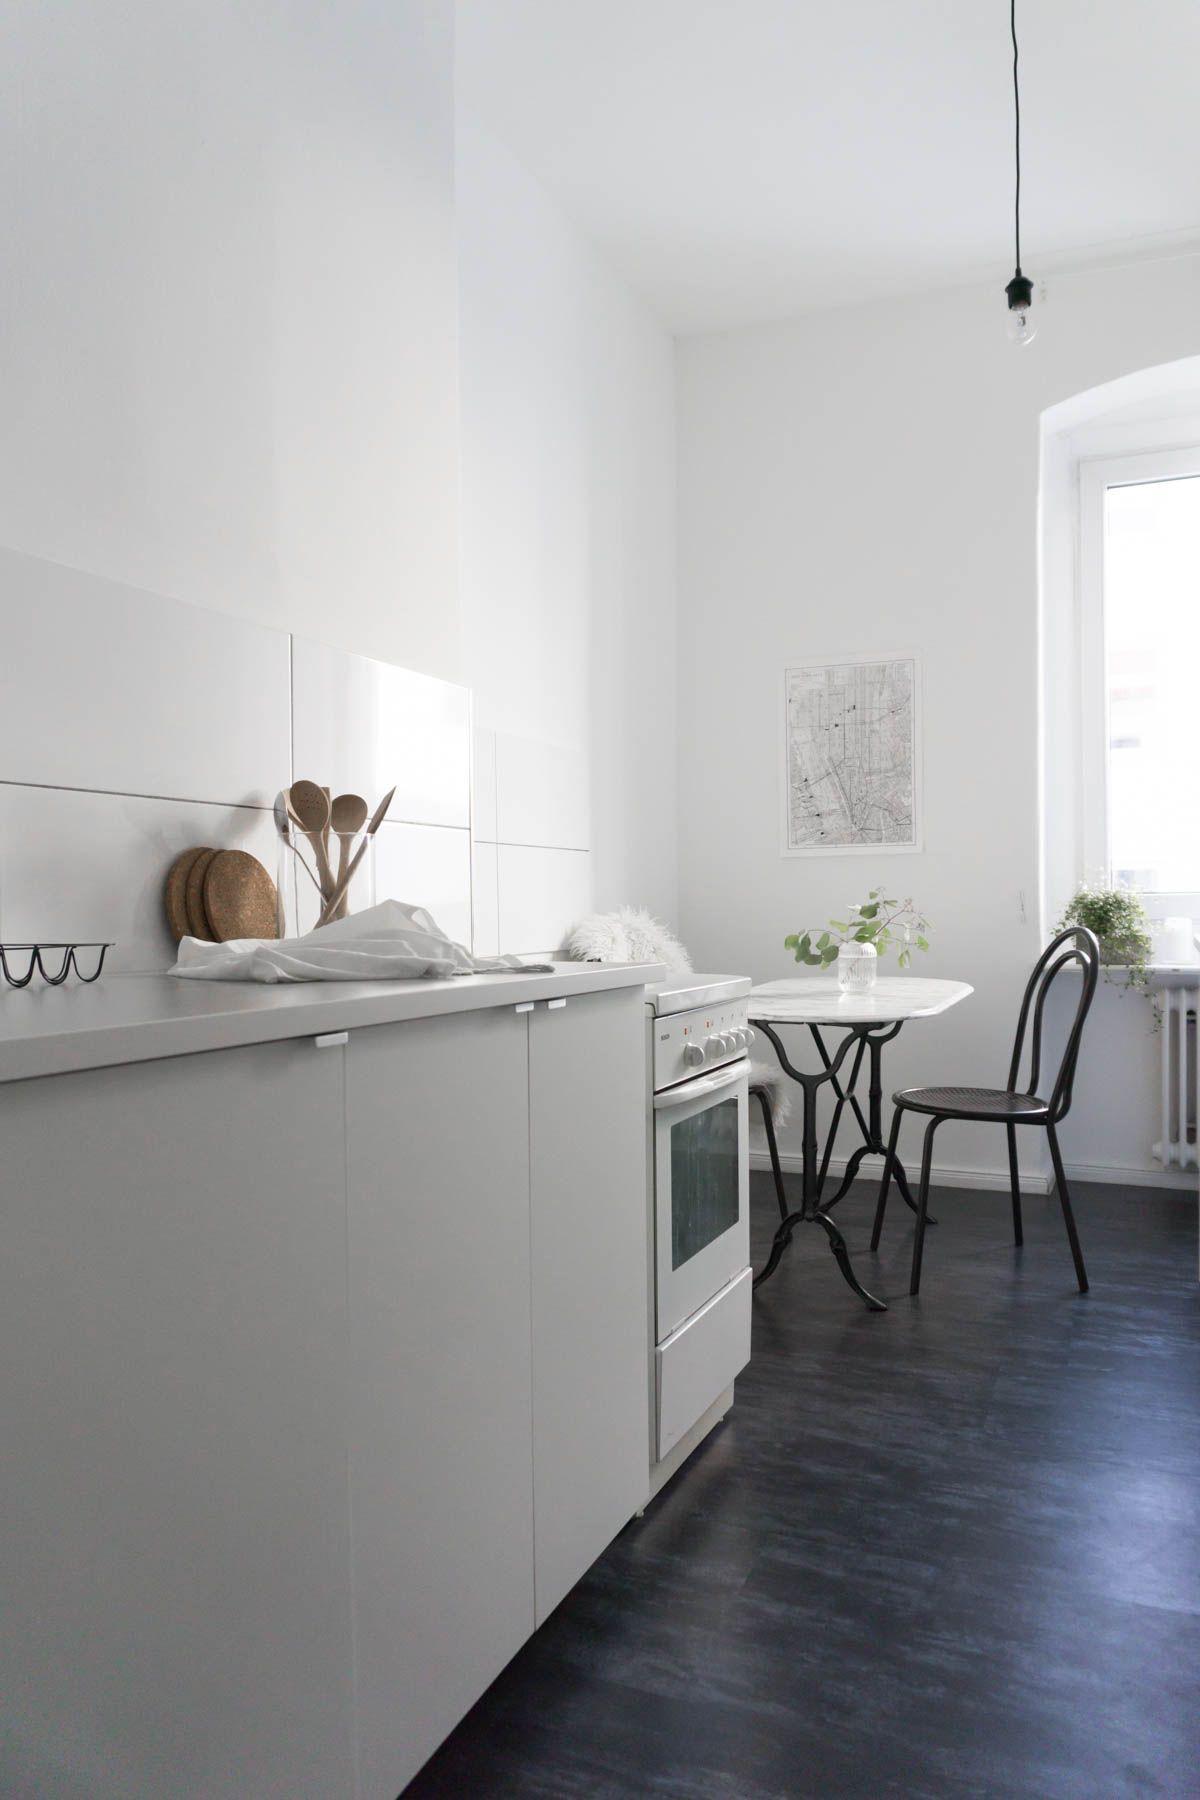 5 Tips For Designing An Ikea Kitchen Rg Daily Scandinavian Kitchen Small Ikea Interior Trendy Kitchen